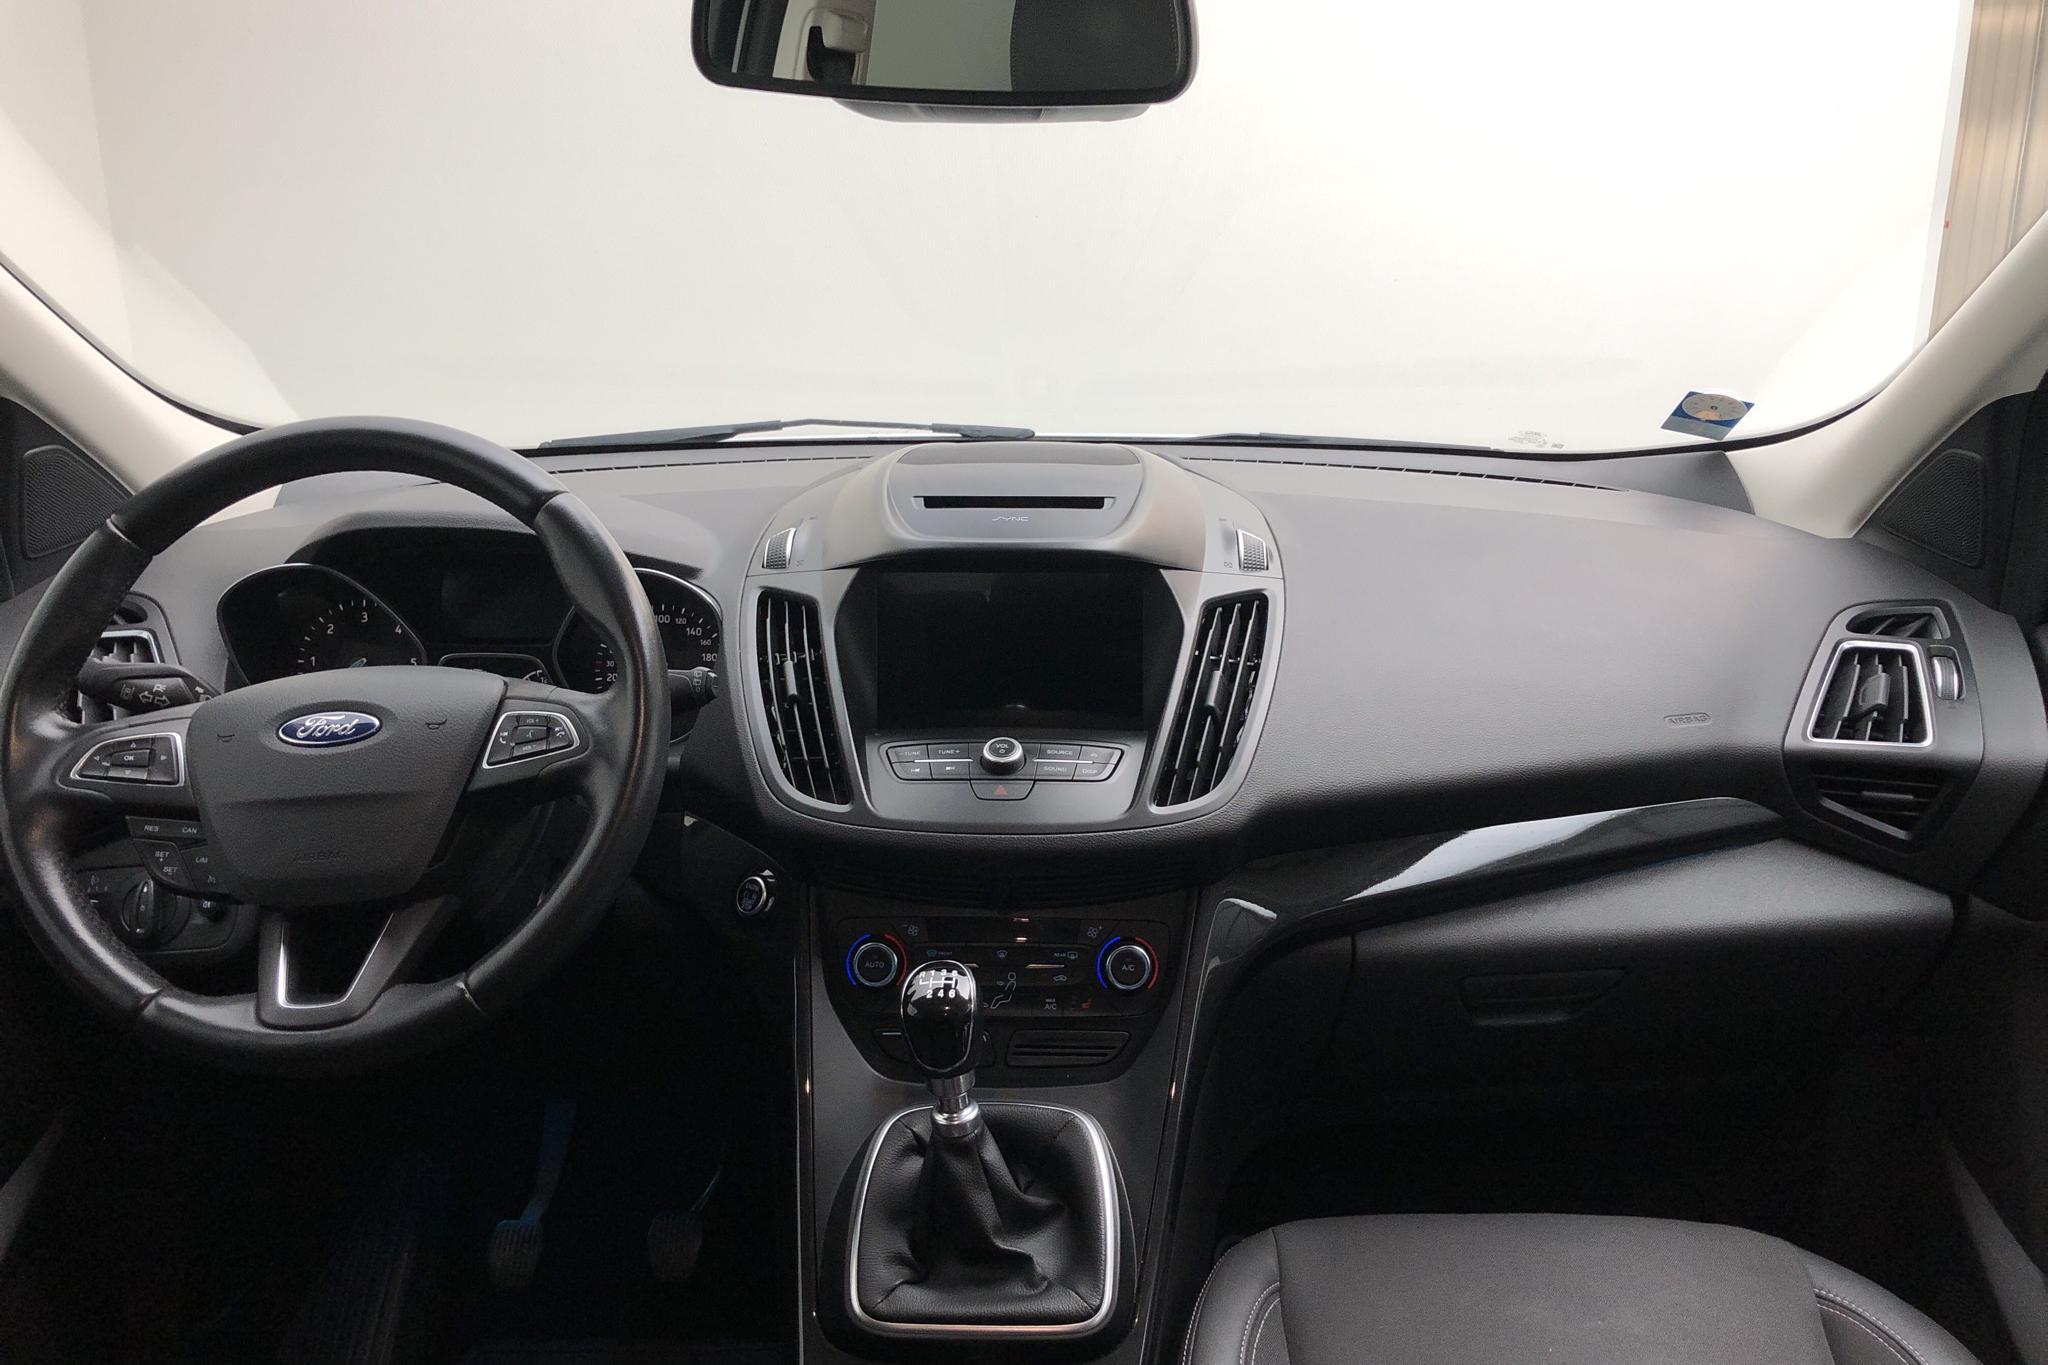 Ford Kuga 1.5 TDCi 2WD (120hk) - 5 900 mil - Manuell - vit - 2018